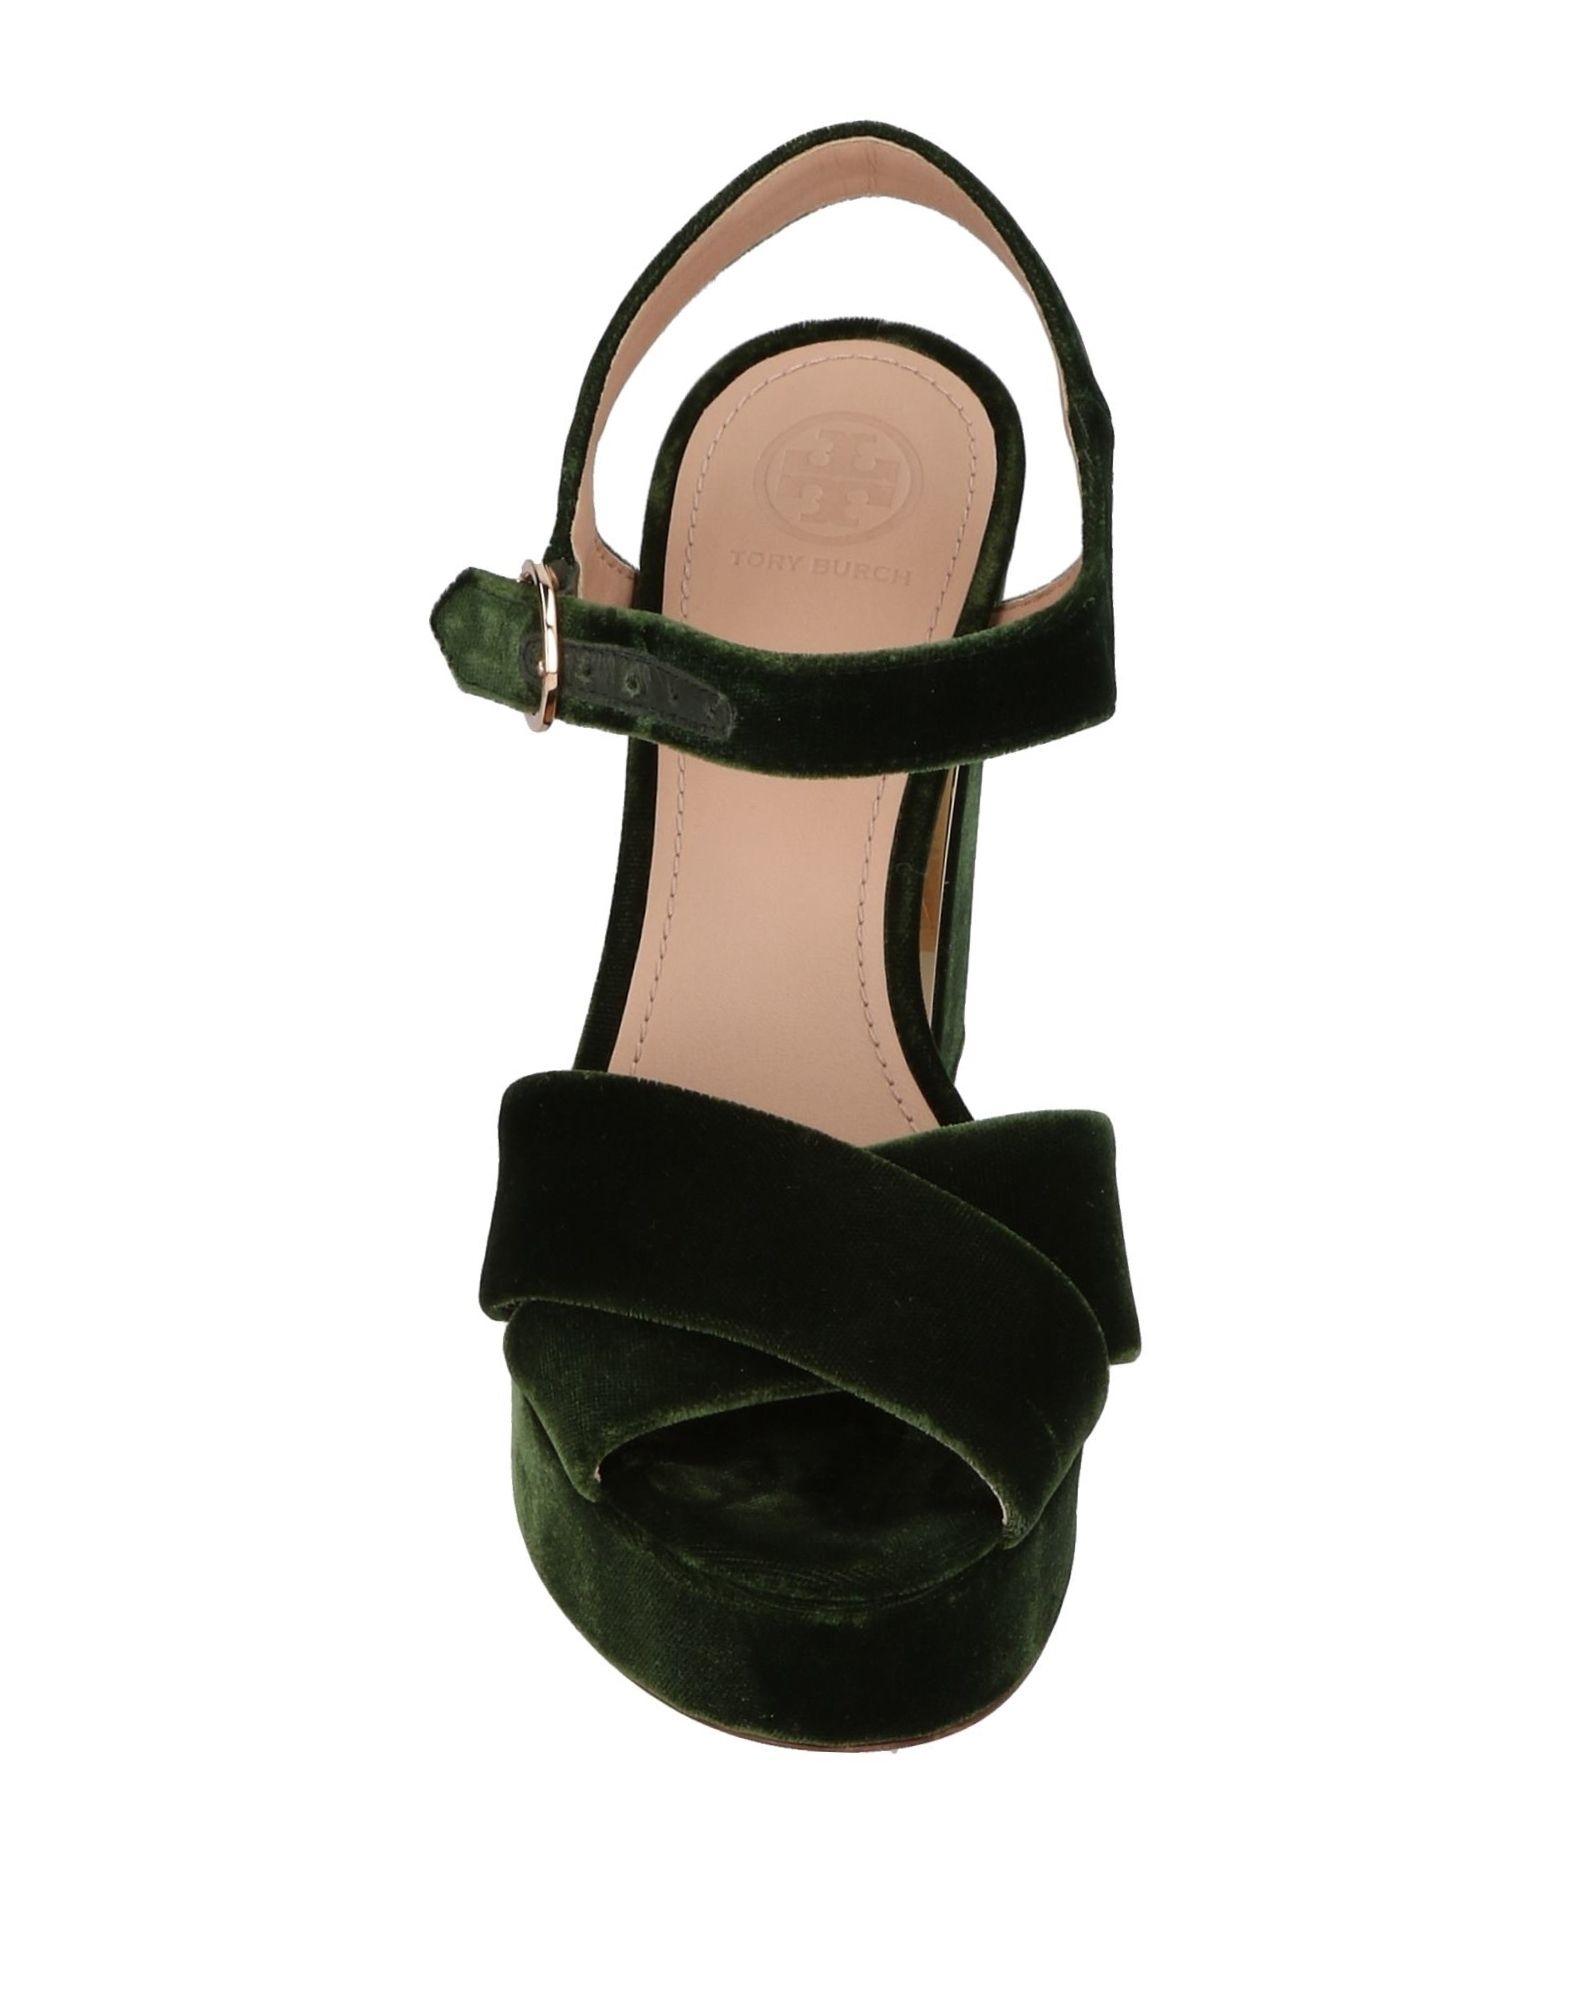 Tory Burch Sandalen Damen  11443220KOGut aussehende strapazierfähige Schuhe